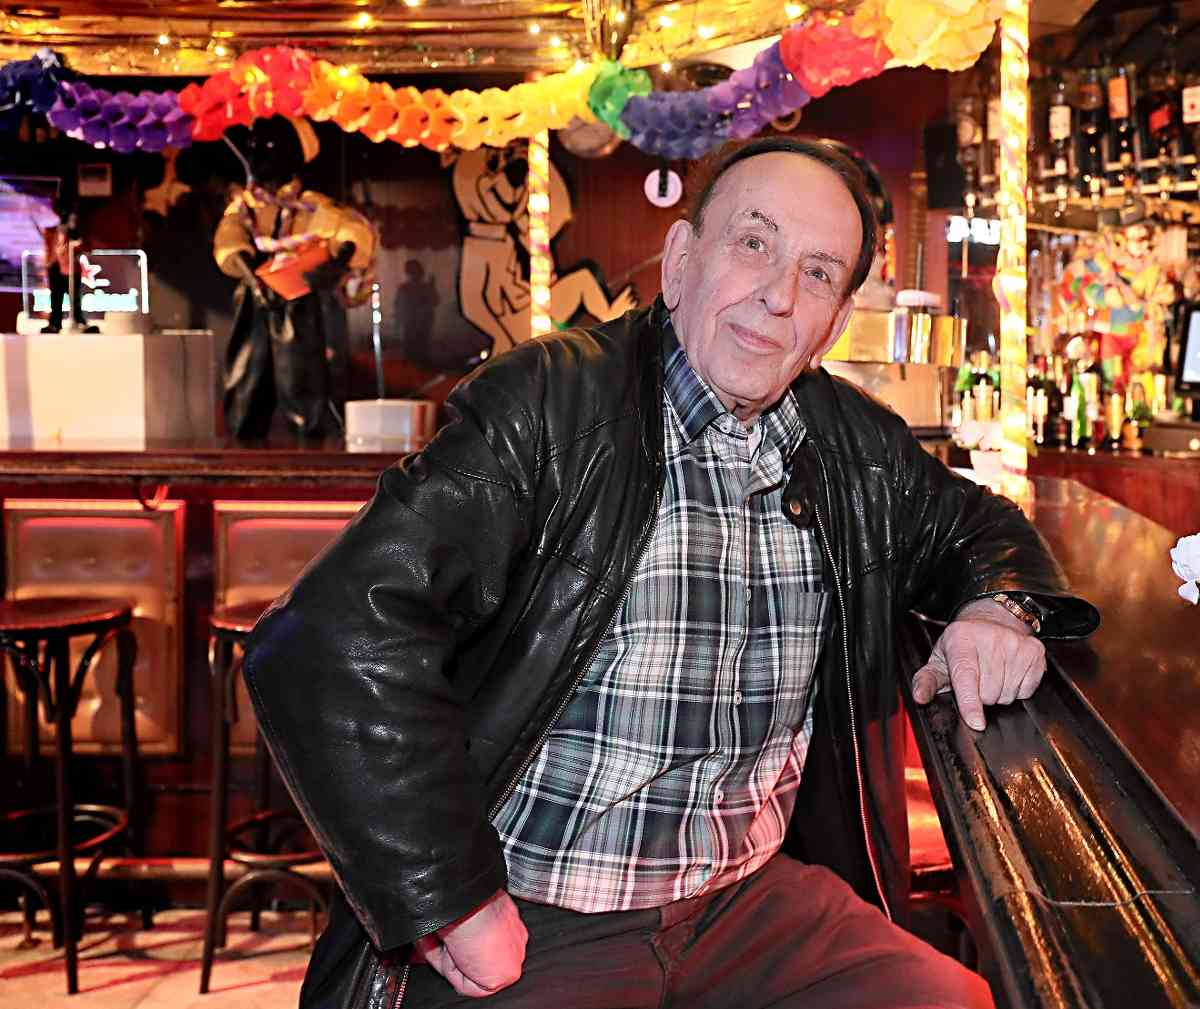 Jogi's Club discothek ist eine Gay Bar in Krefeld